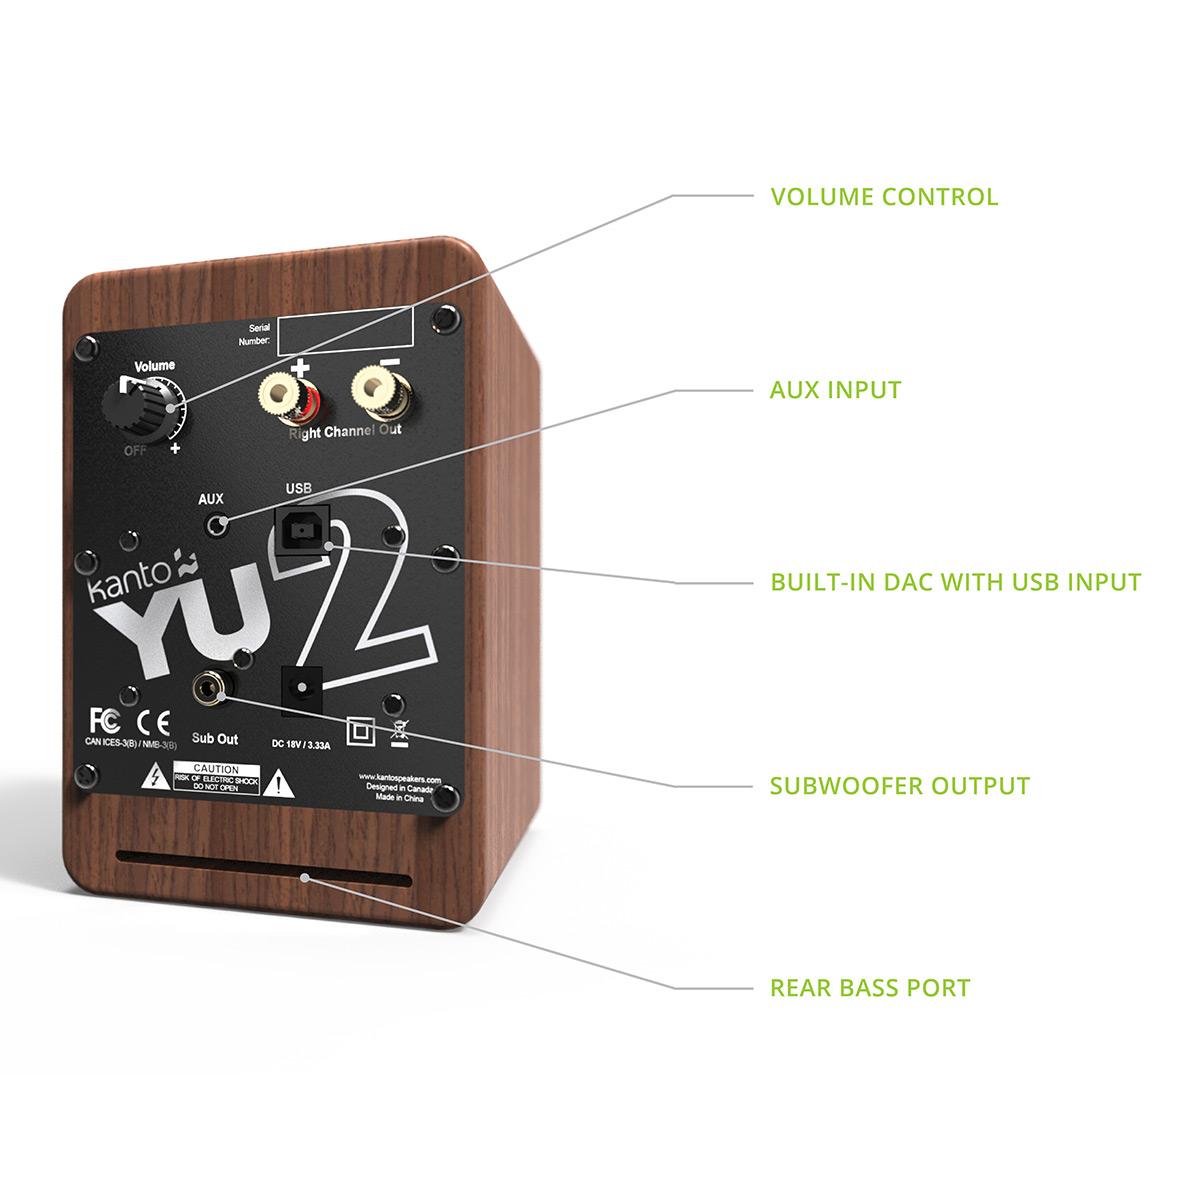 thumbnail 16 - Kanto YU2 Powered Desktop Speakers - Pair